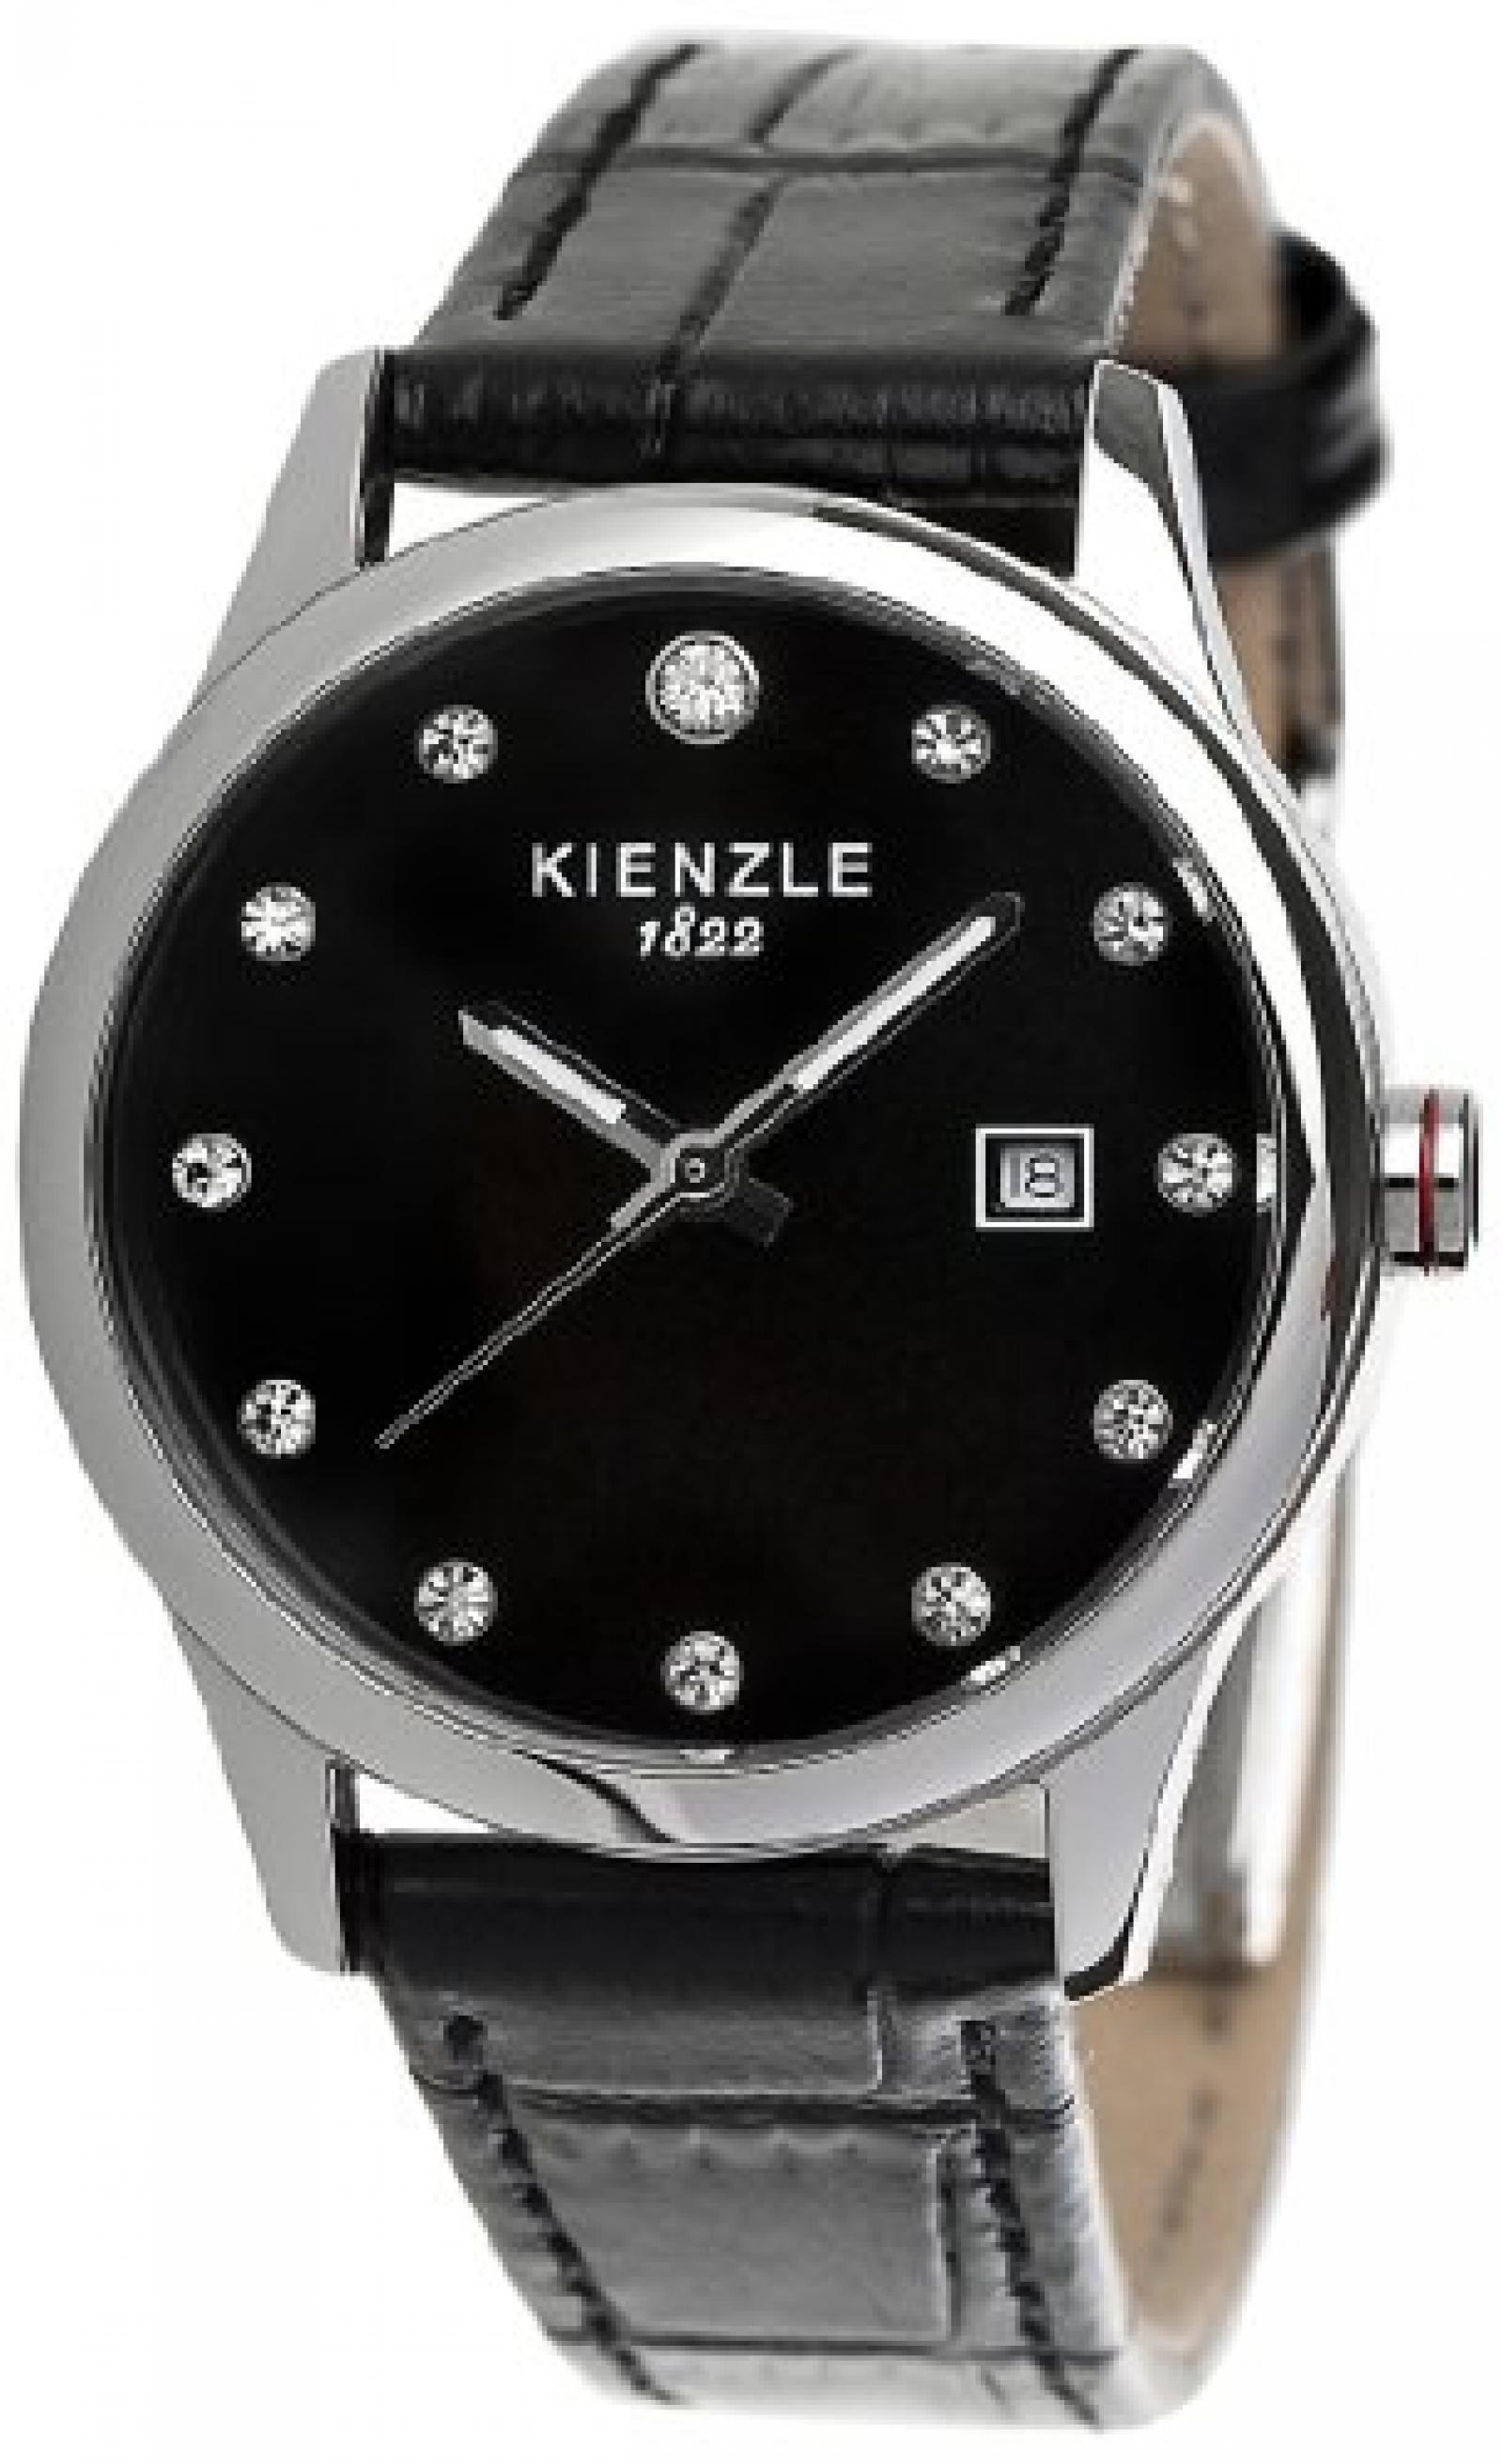 Kienzle Damen-Armbanduhr XS KIENZLE CORE Analog Quarz Lederarmband K3042014261-00371